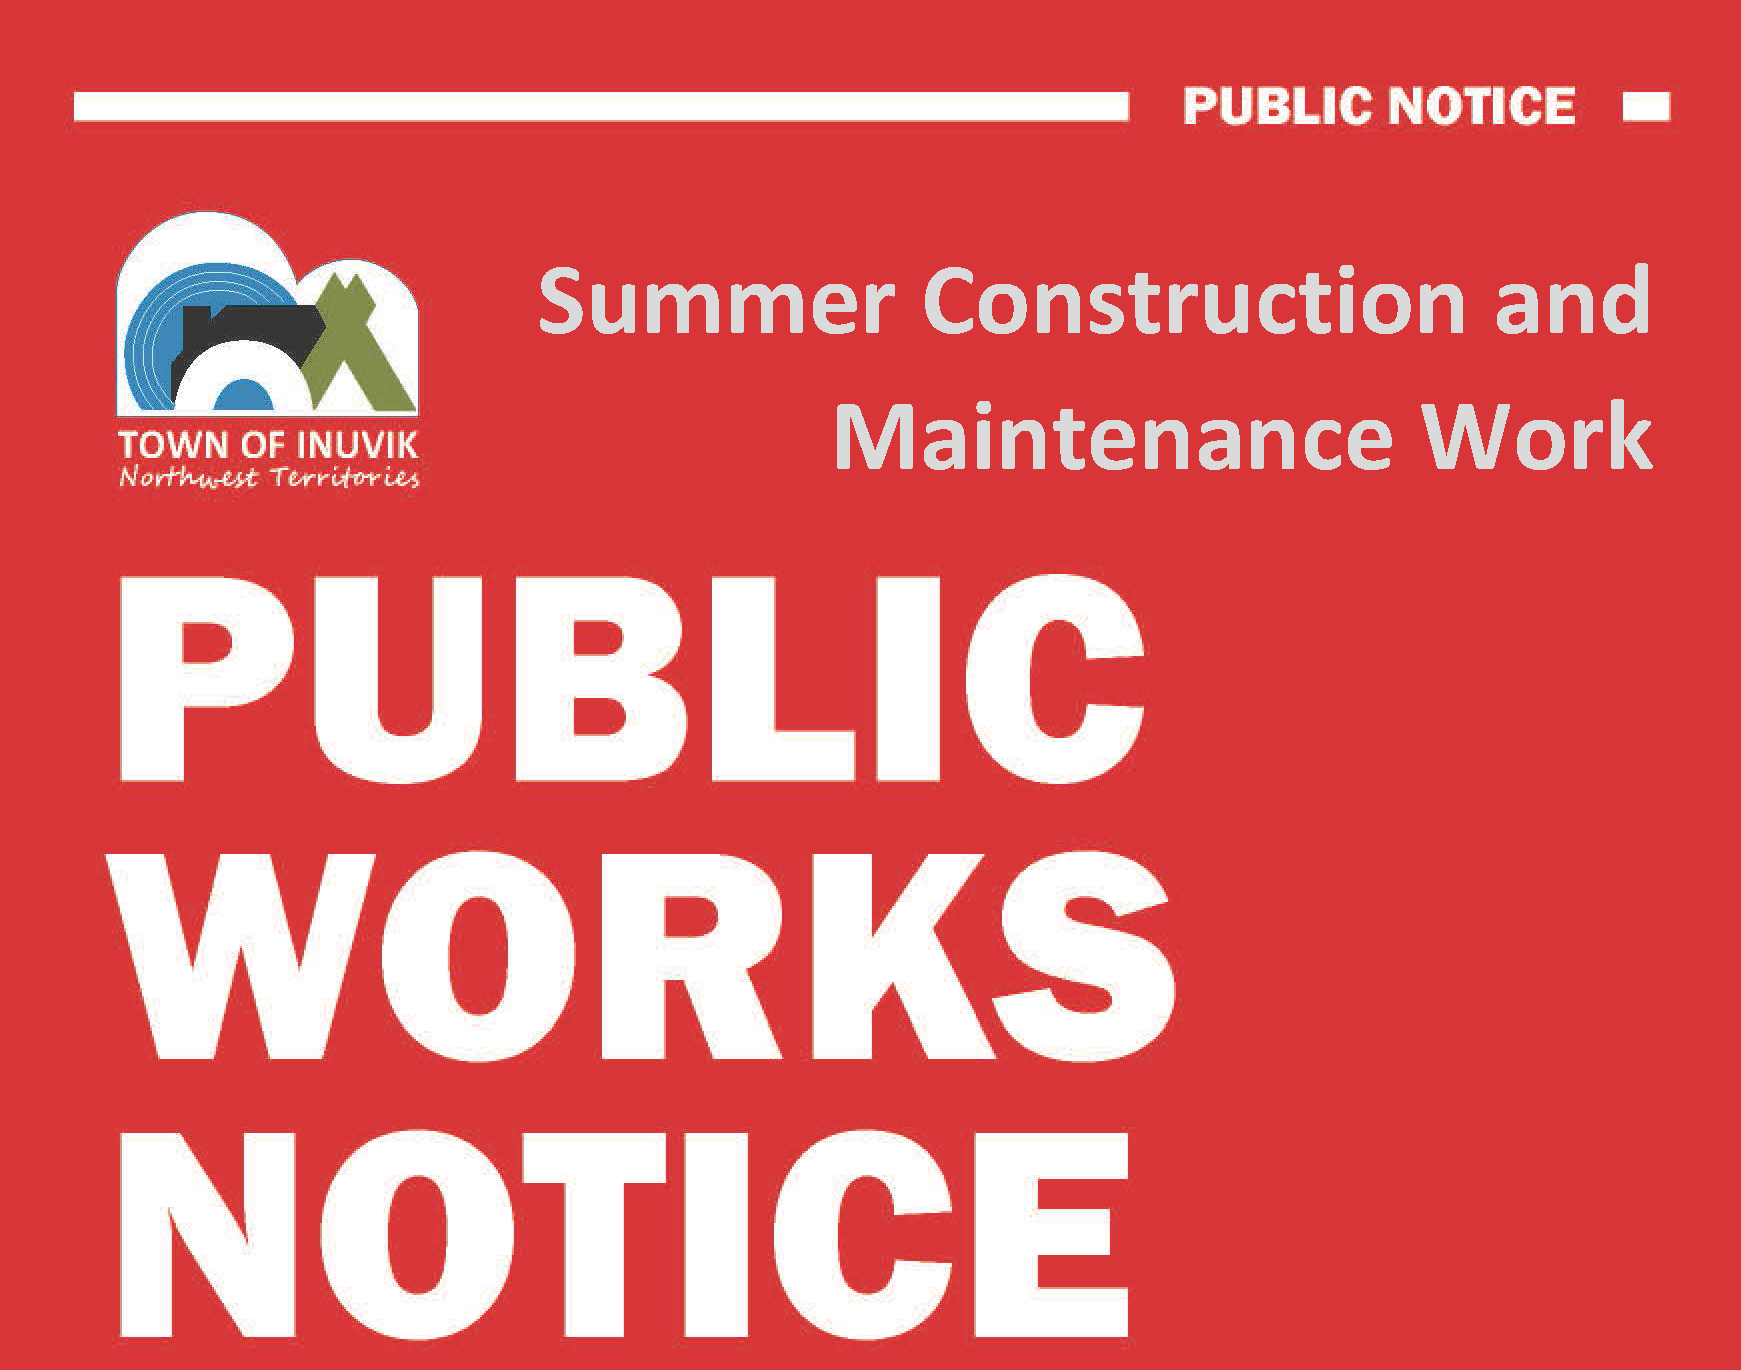 Public Works Notice - Summer 2020 Construction & Maintenance Work